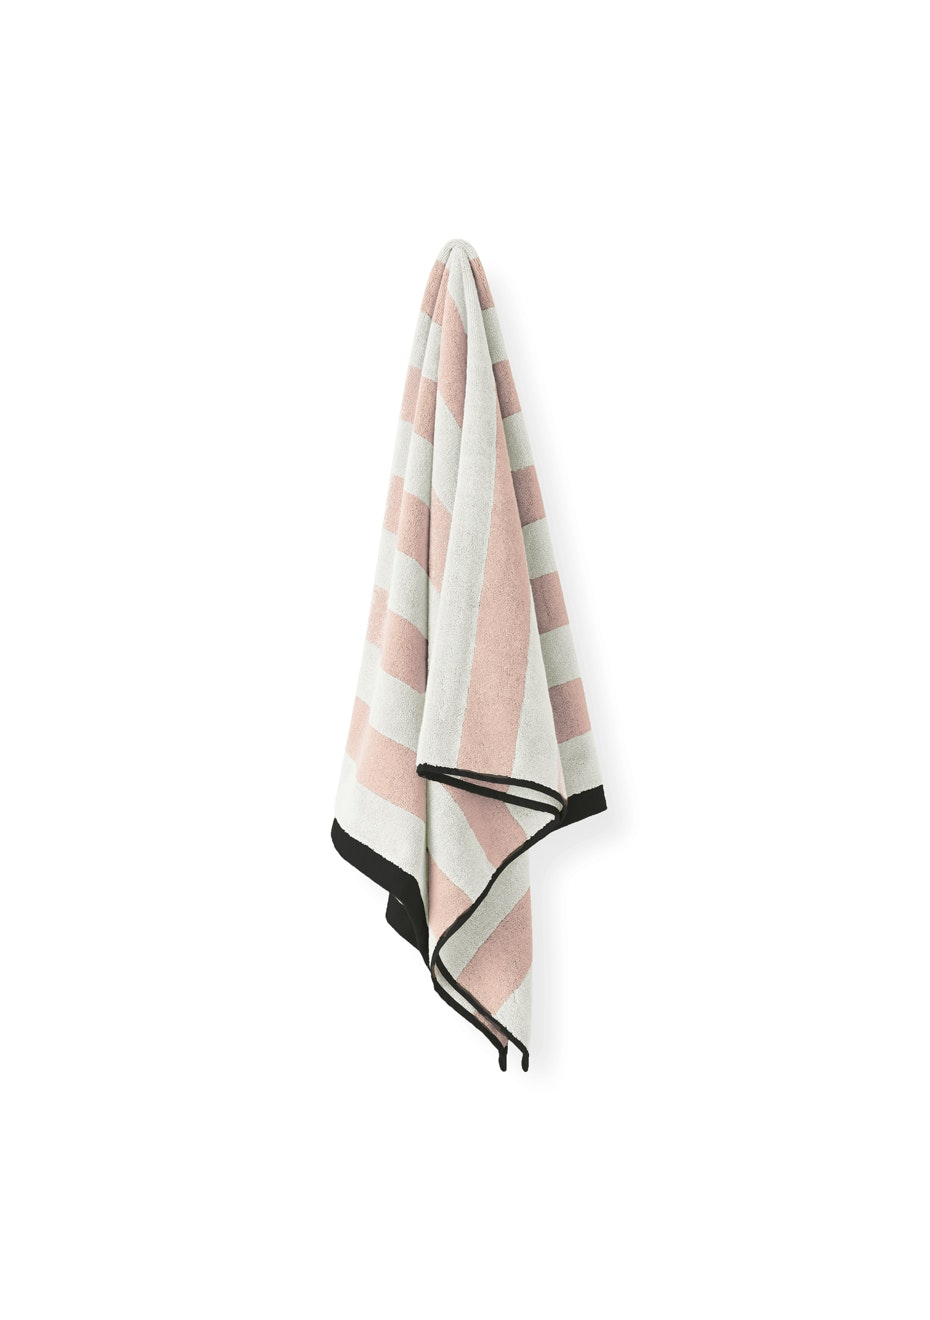 Aura Stripes Bath Towel 700 X 1400Mm Pink